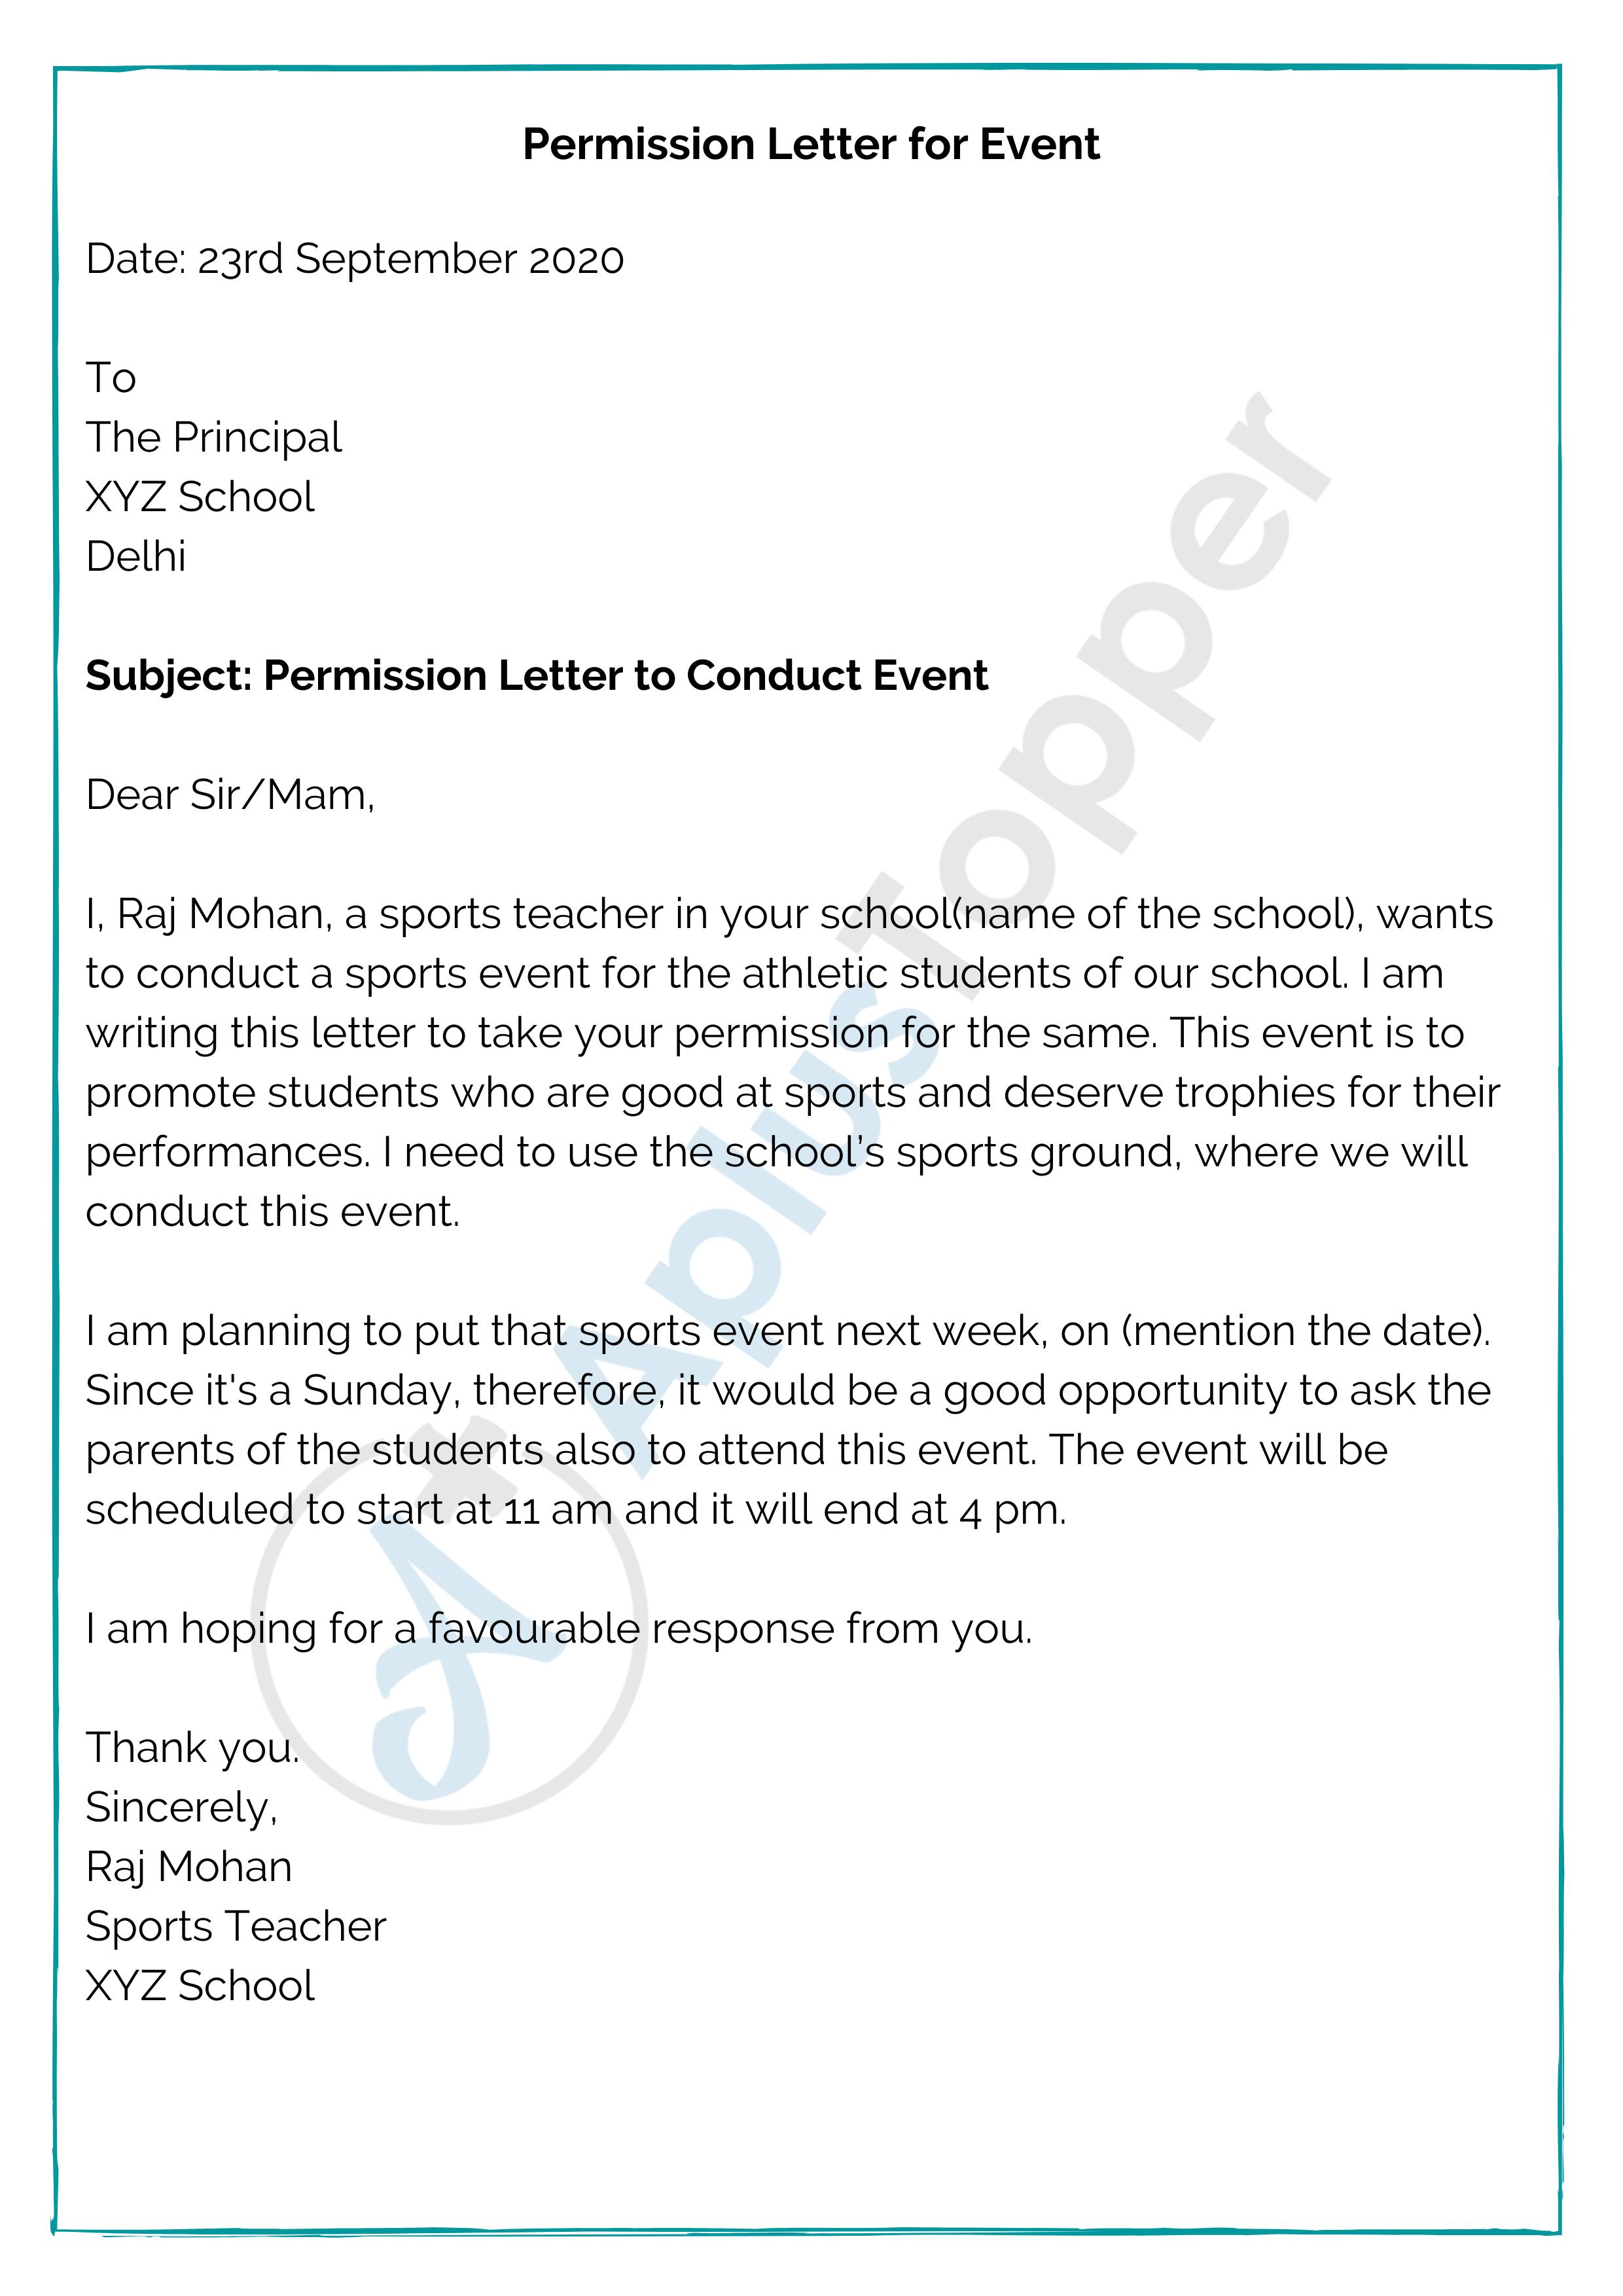 Permission Letter for Event